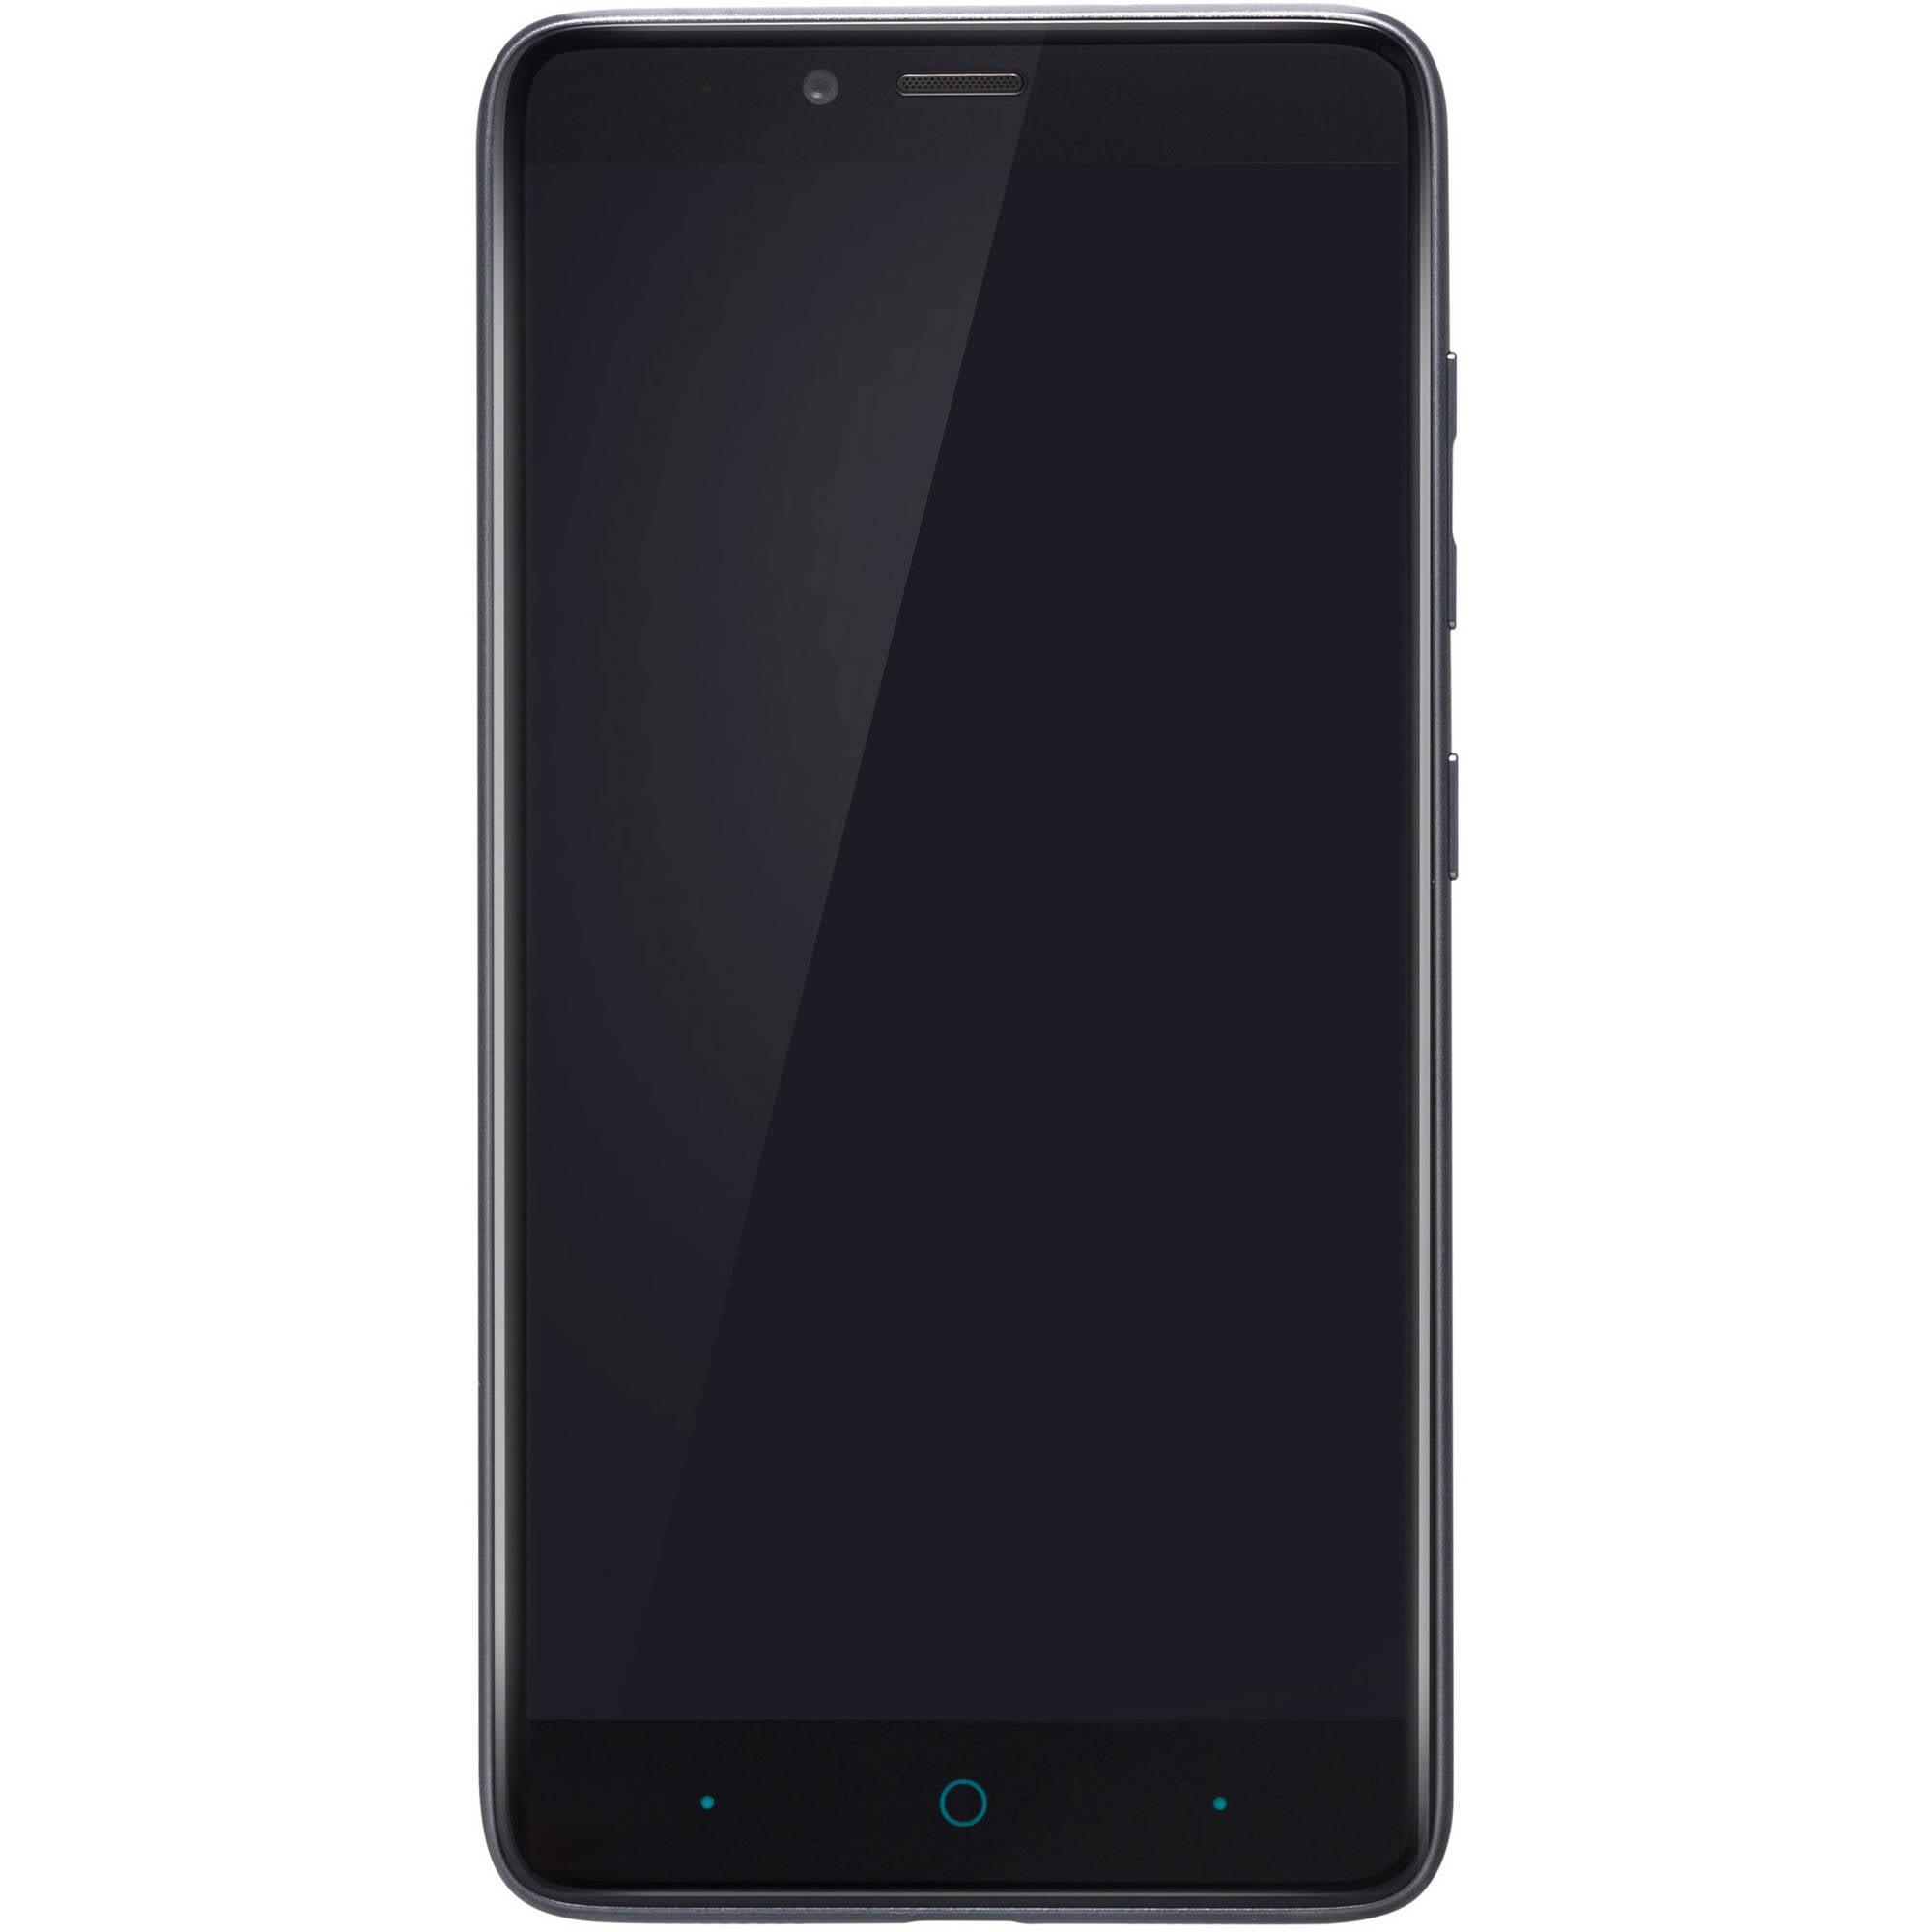 US Cellular ZTE Imperial MAX Z963U Prepaid Smartphone - Walmart.com